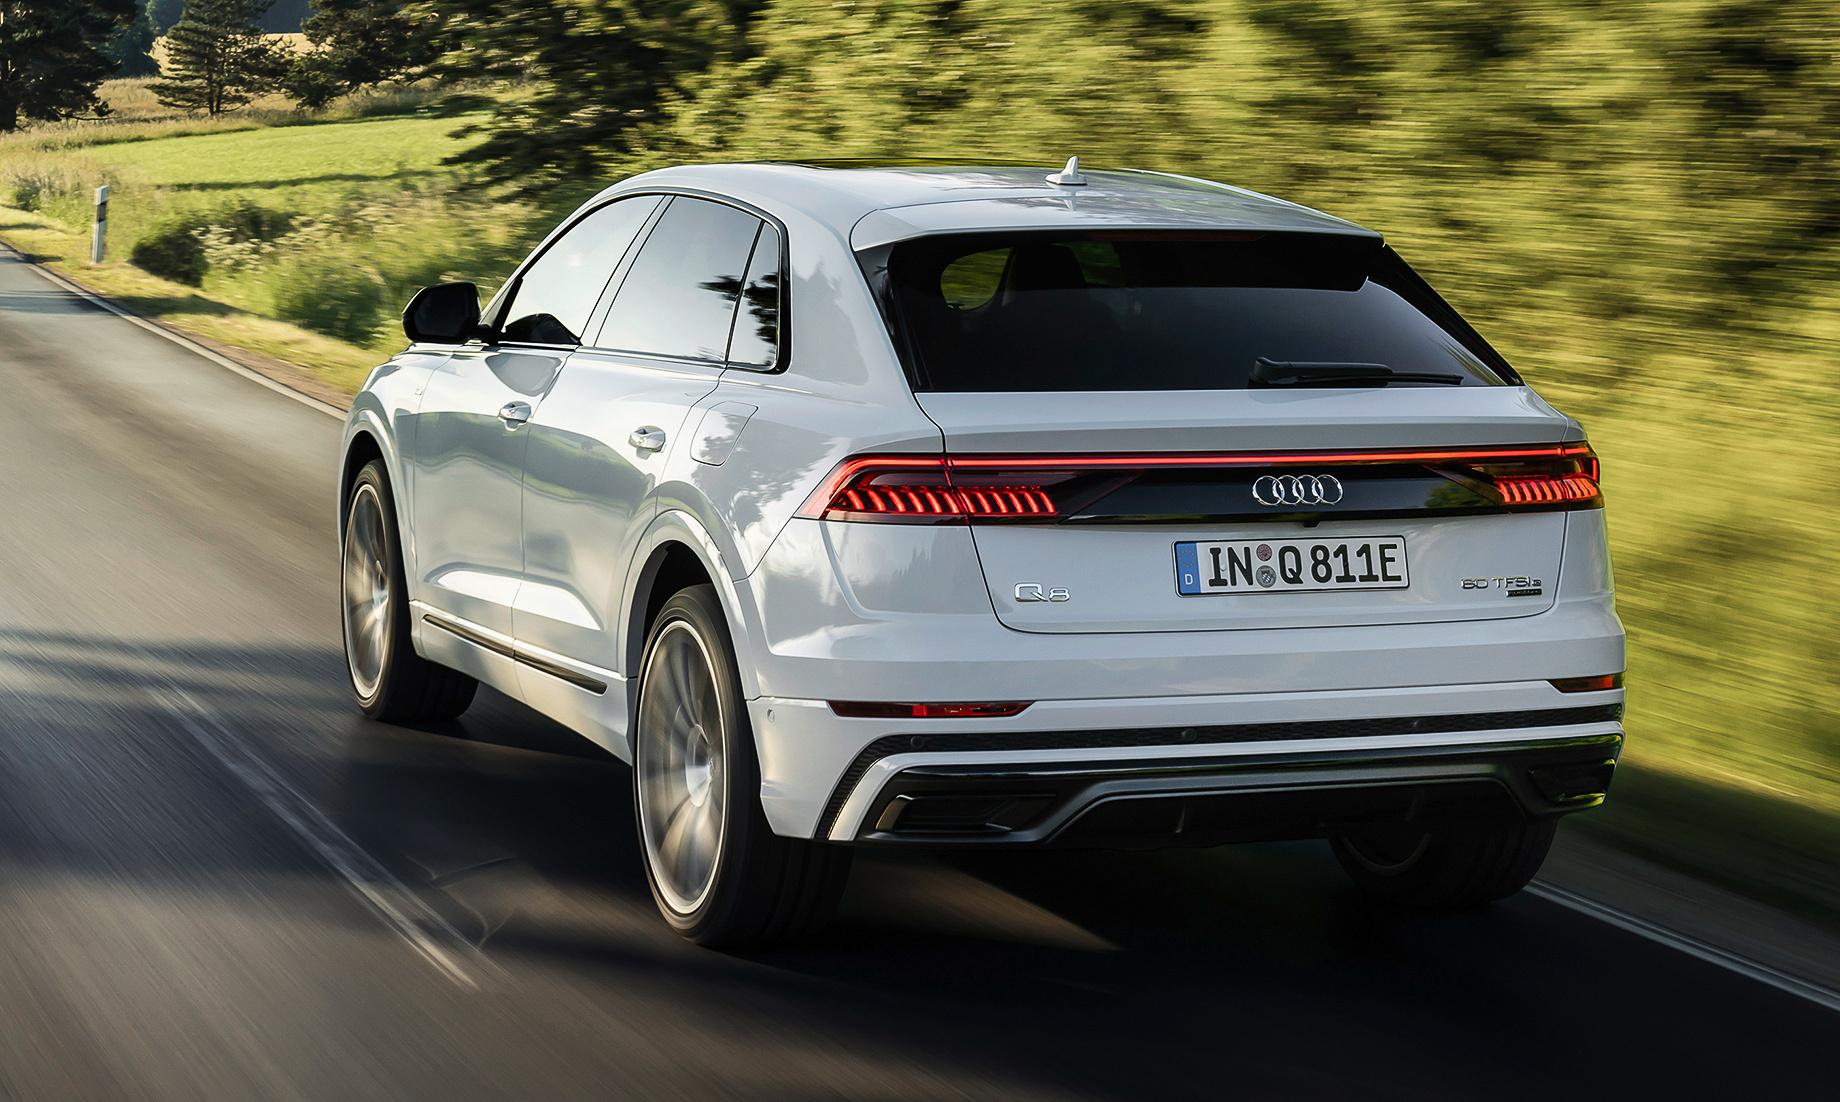 Раскрыты характеристики гибрида Audi Q8 TFSI e quattro